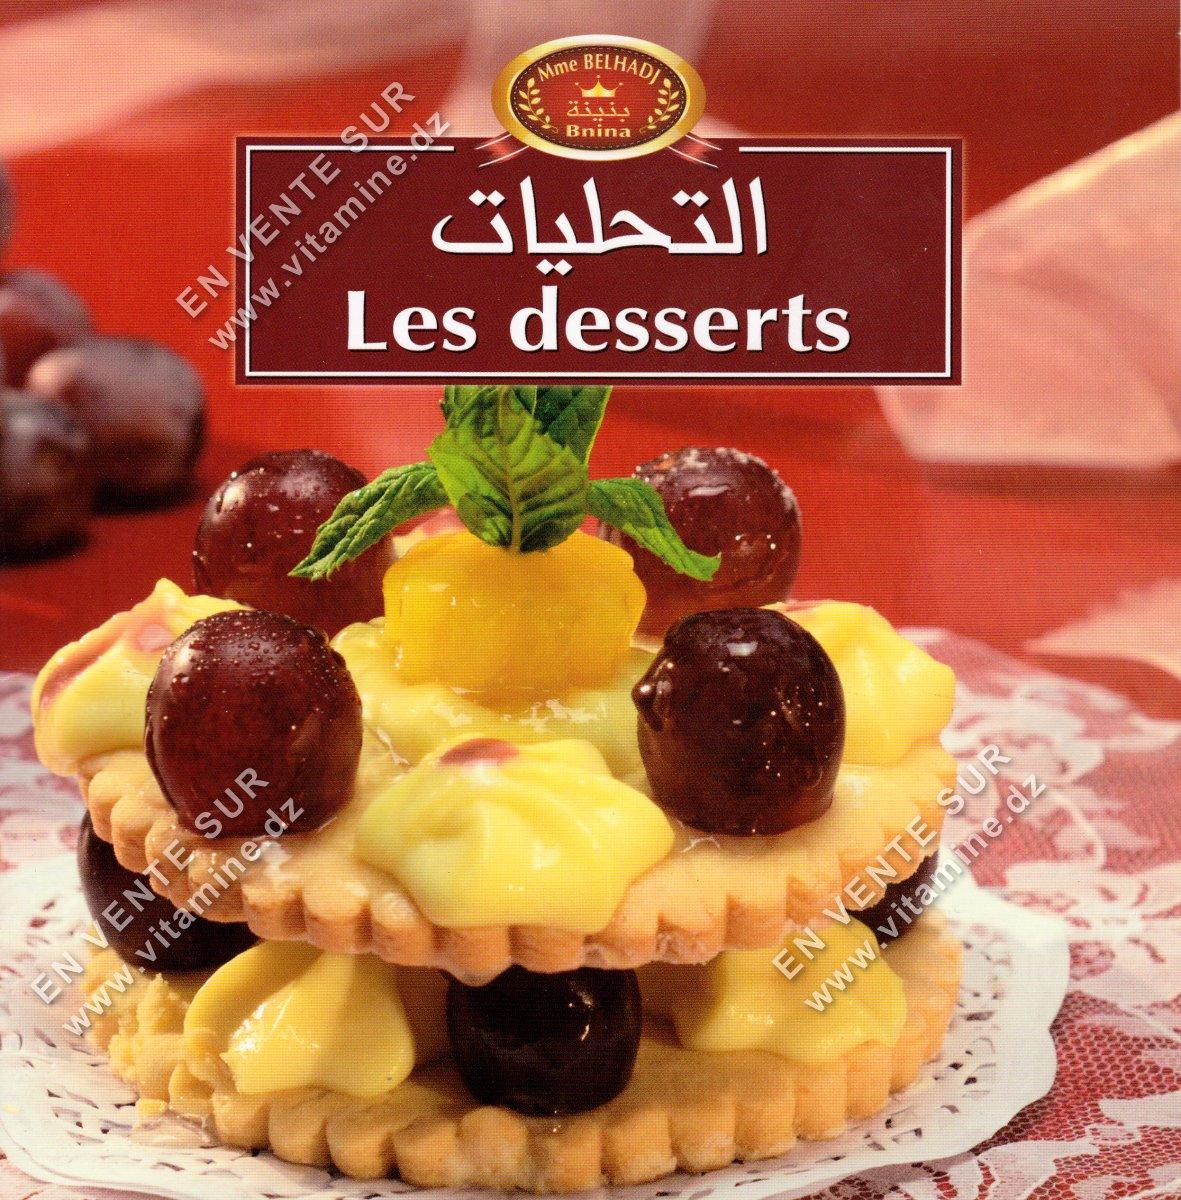 Bnina - Les desserts